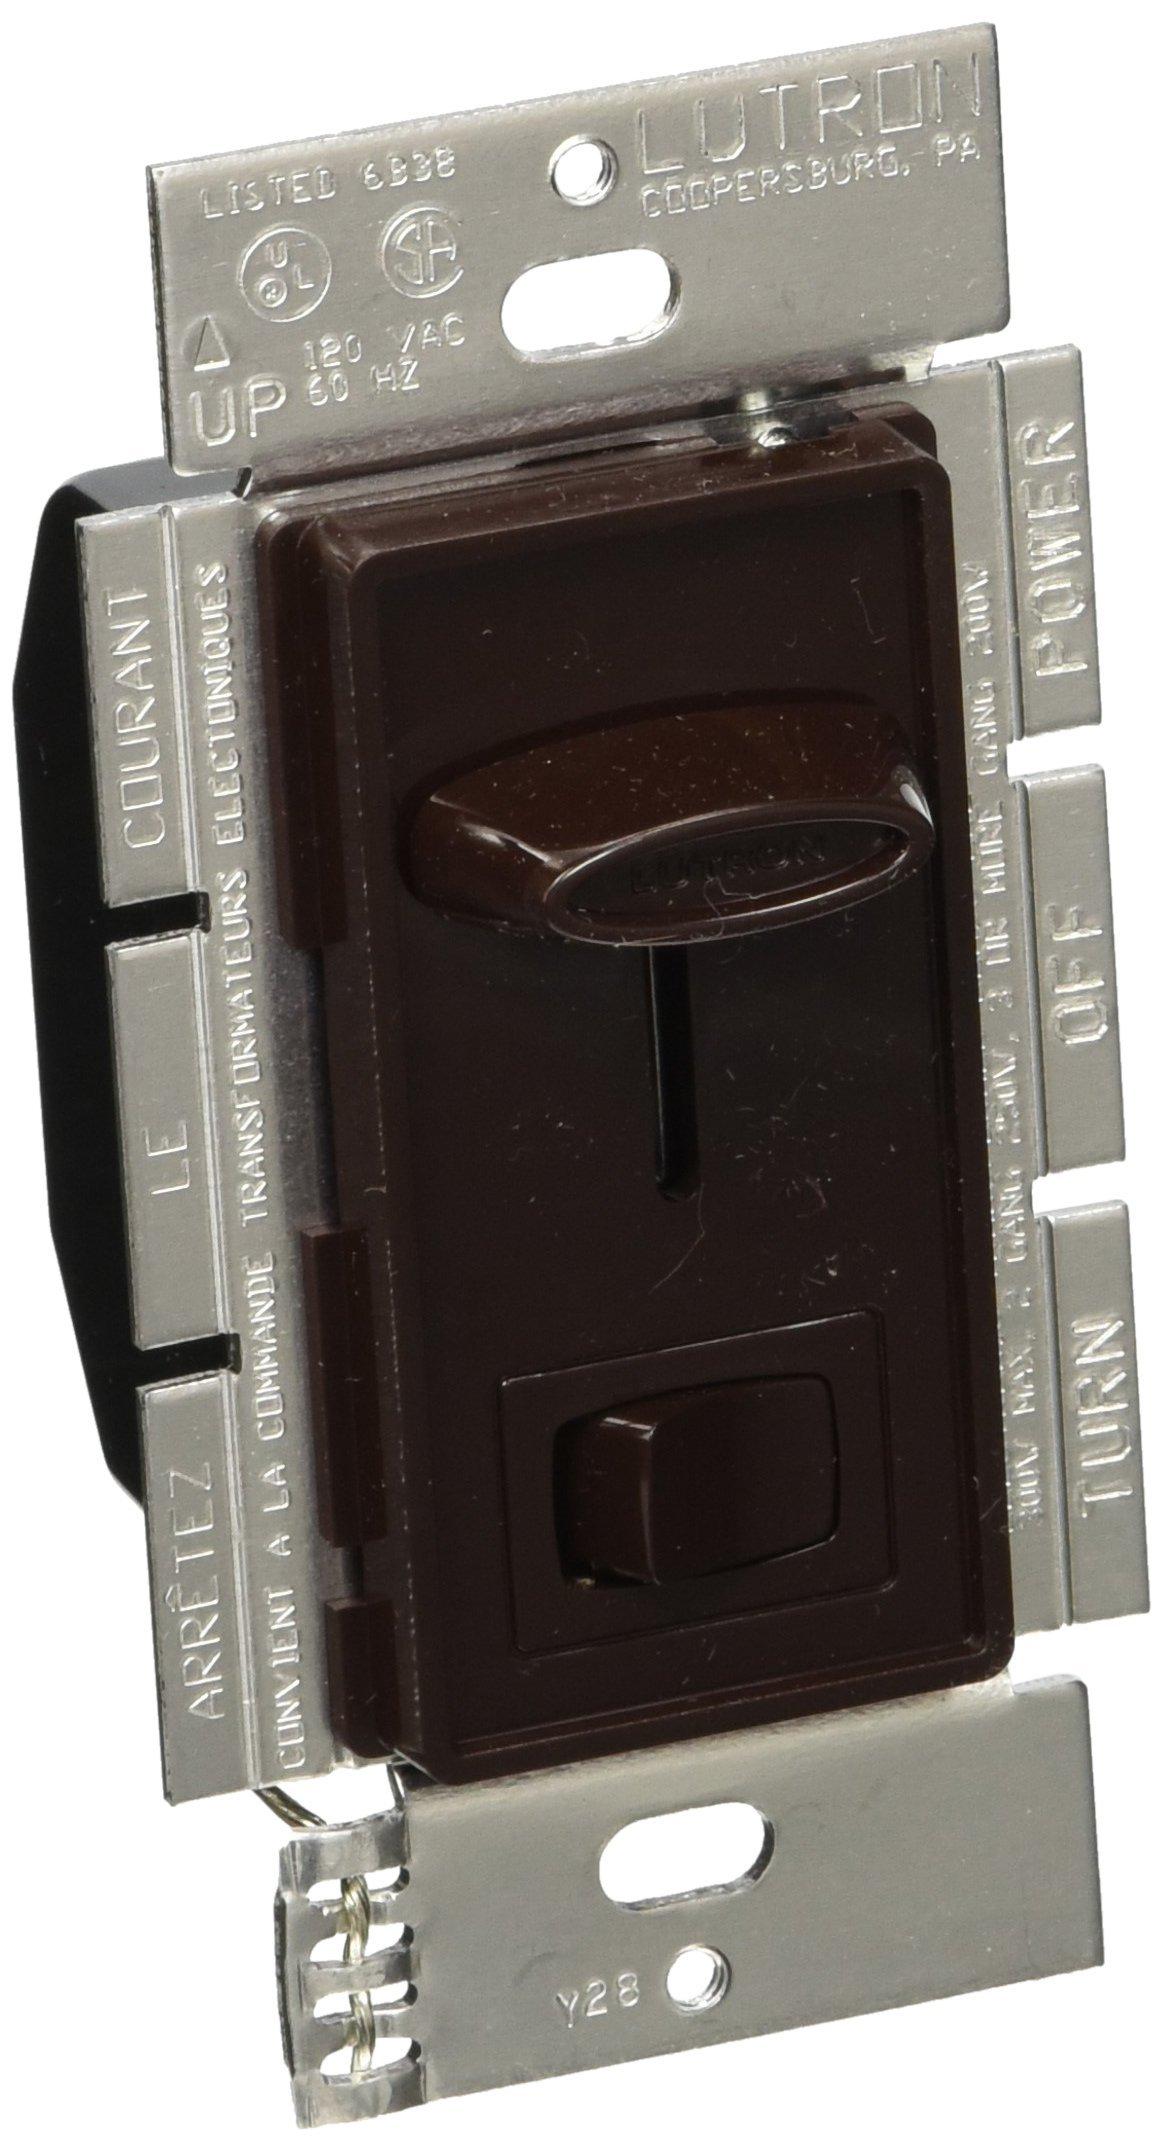 Lutron Lutron SELV-303P-BR Skylark 300-Watt 3-Way Electronic Low-Voltage Dimmer, Brown